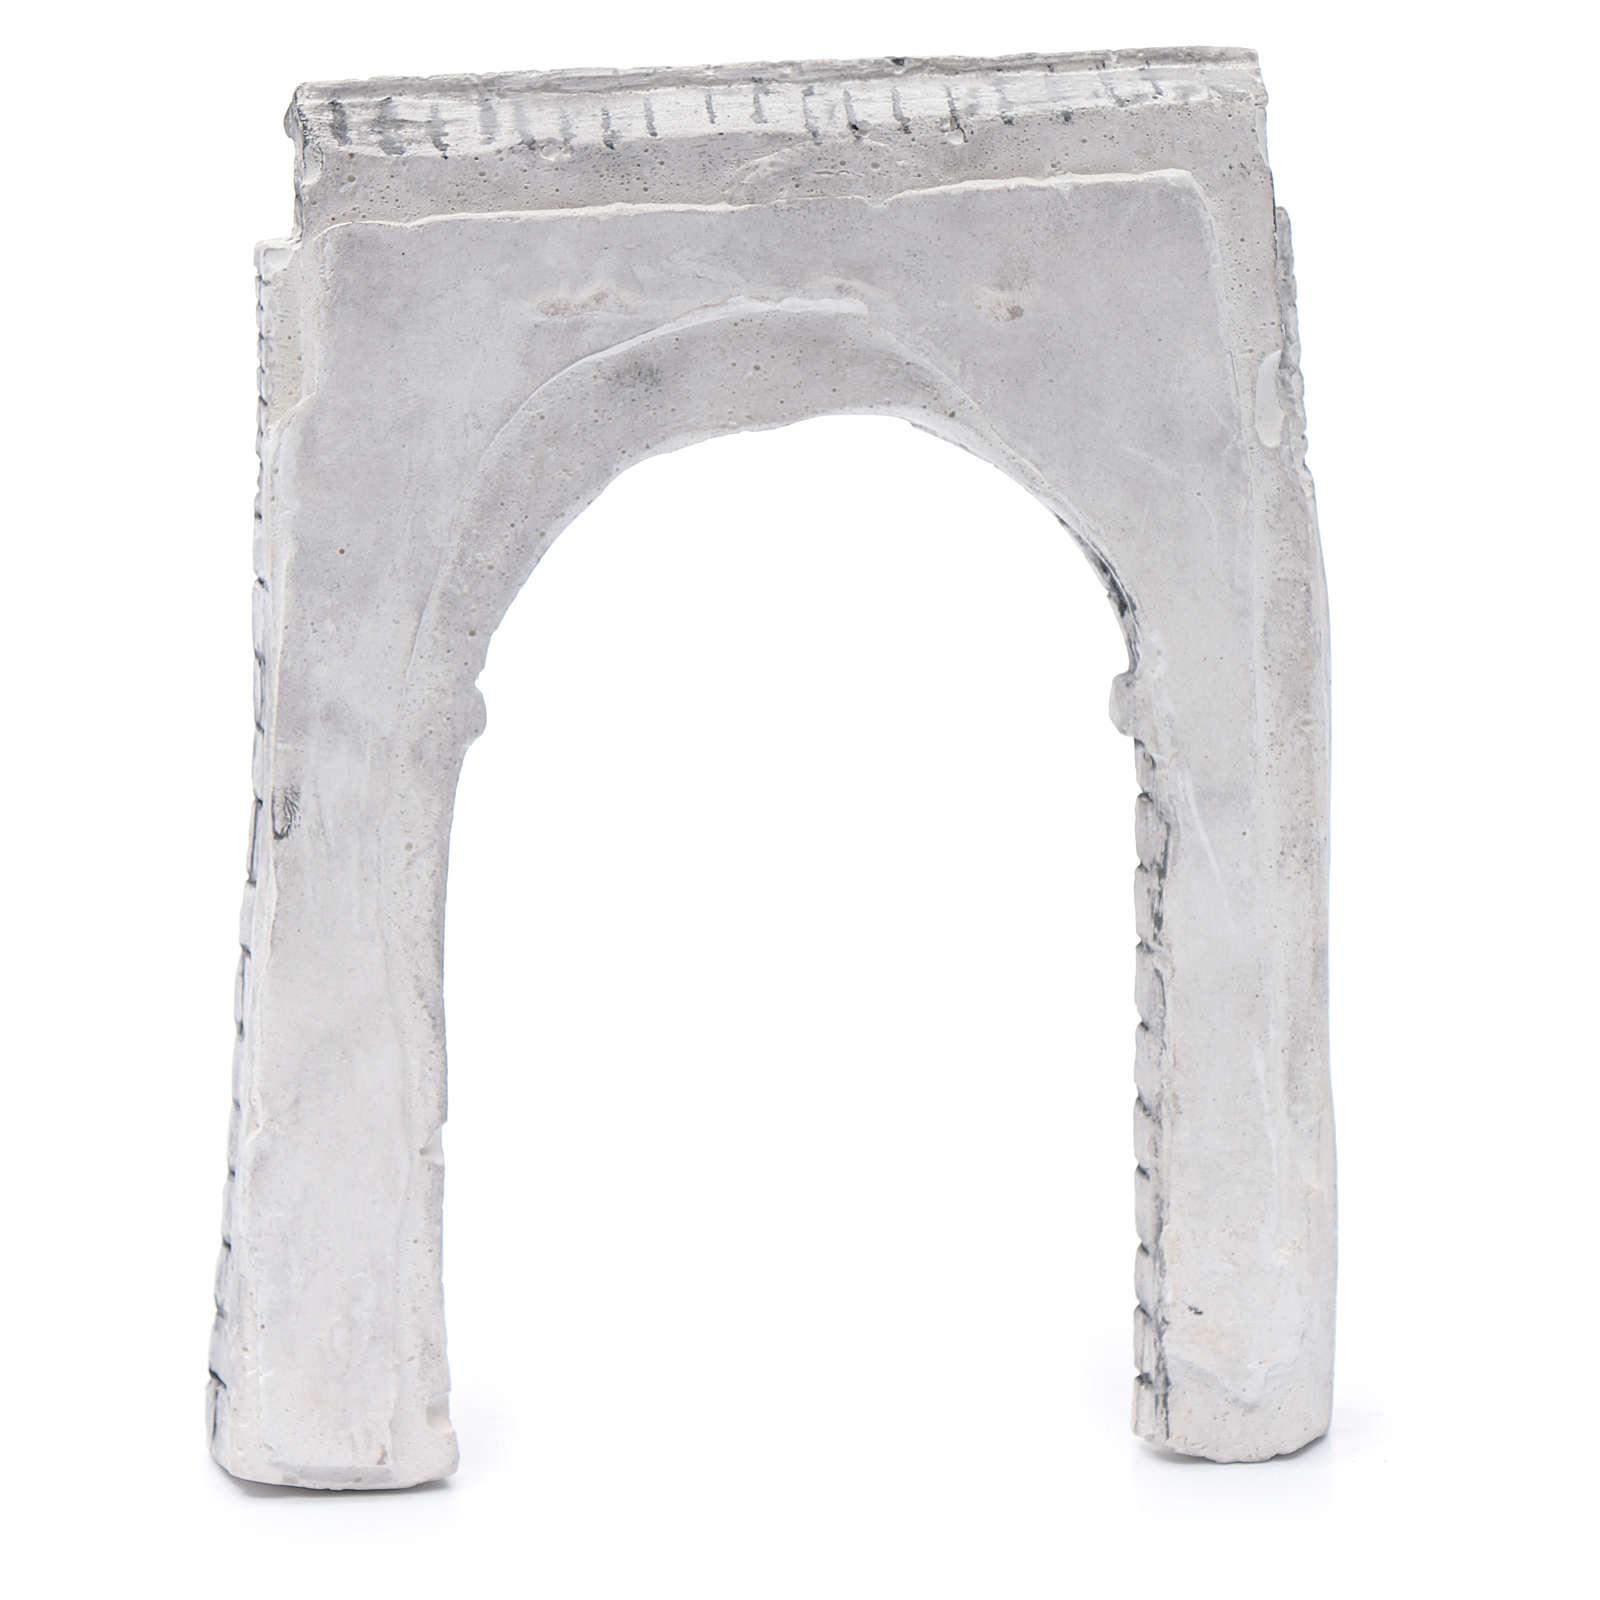 Parete ad arco resina 15x15 cm per presepe 4